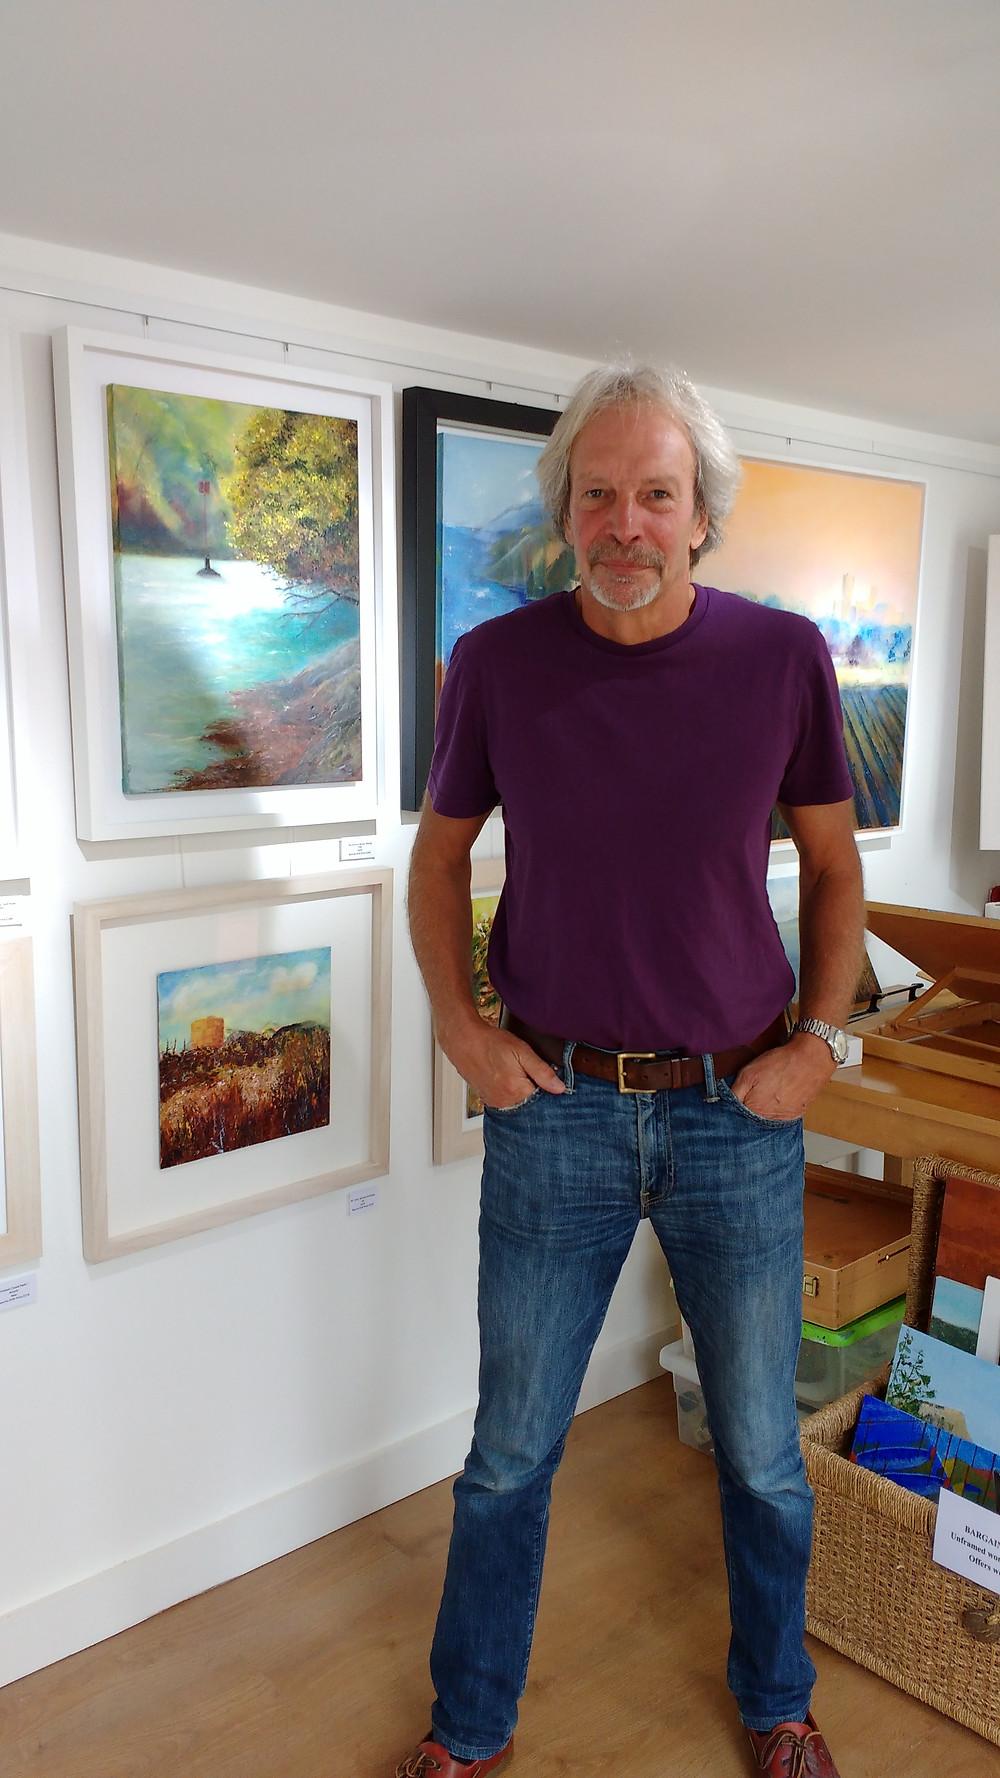 Alan Gregory